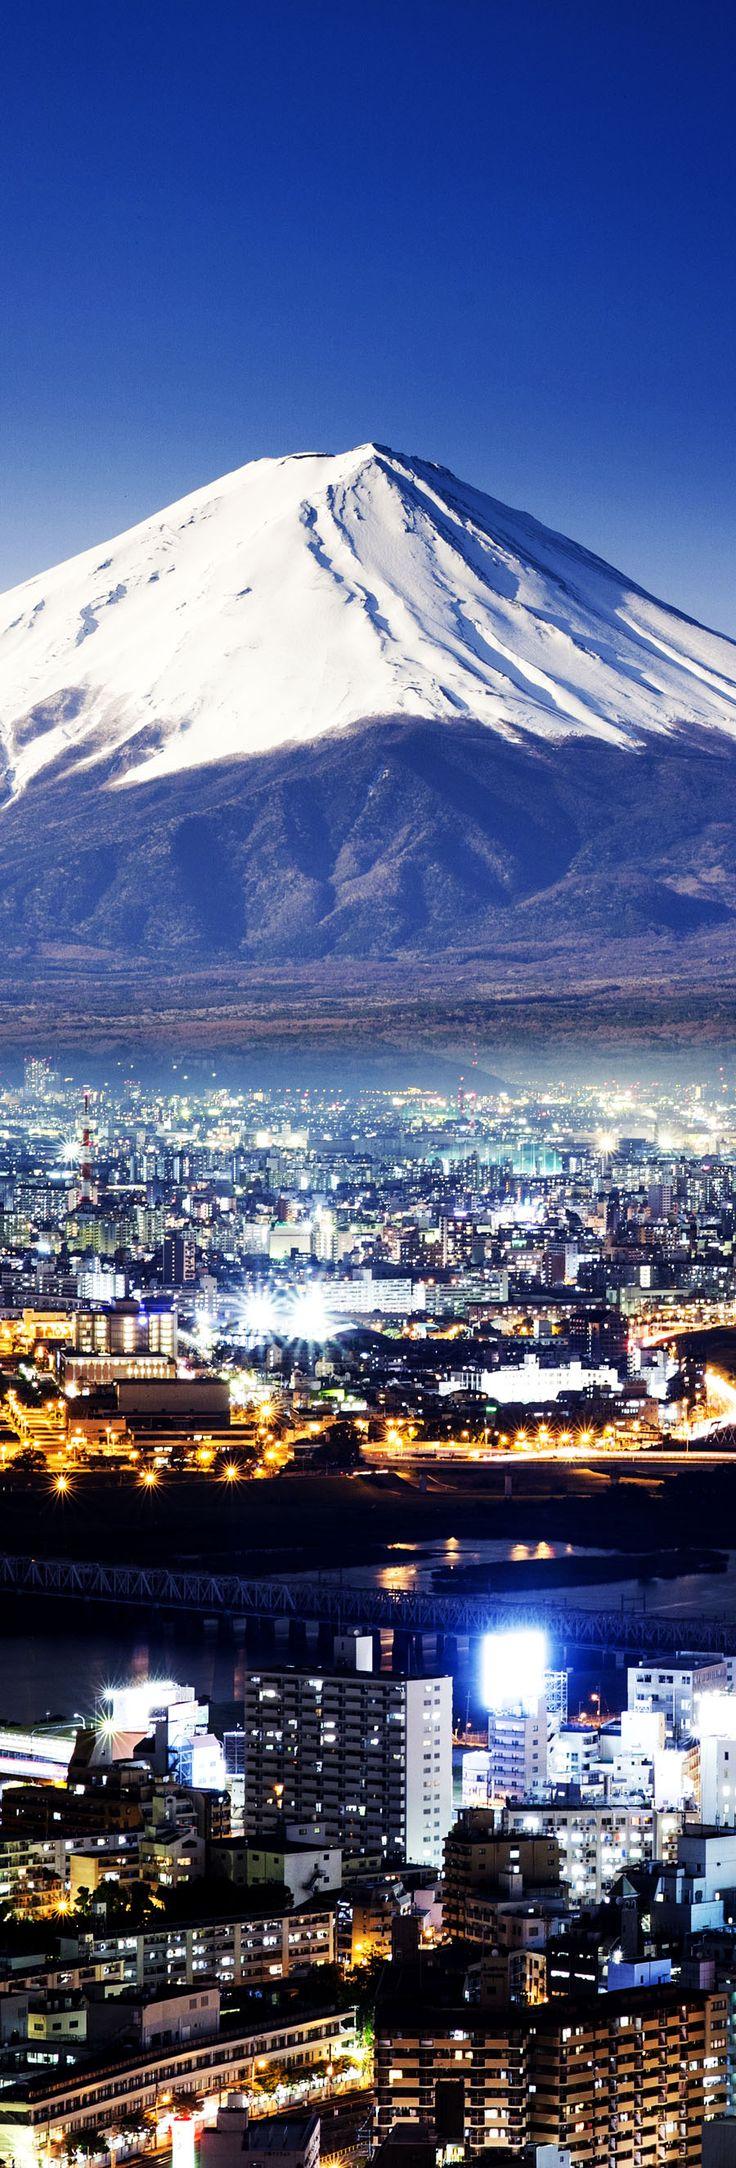 Mount Fuji. Fujiyama, Beautiful Japan     |   Amazing Photography Of Cities and Famous Landmarks From Around The World